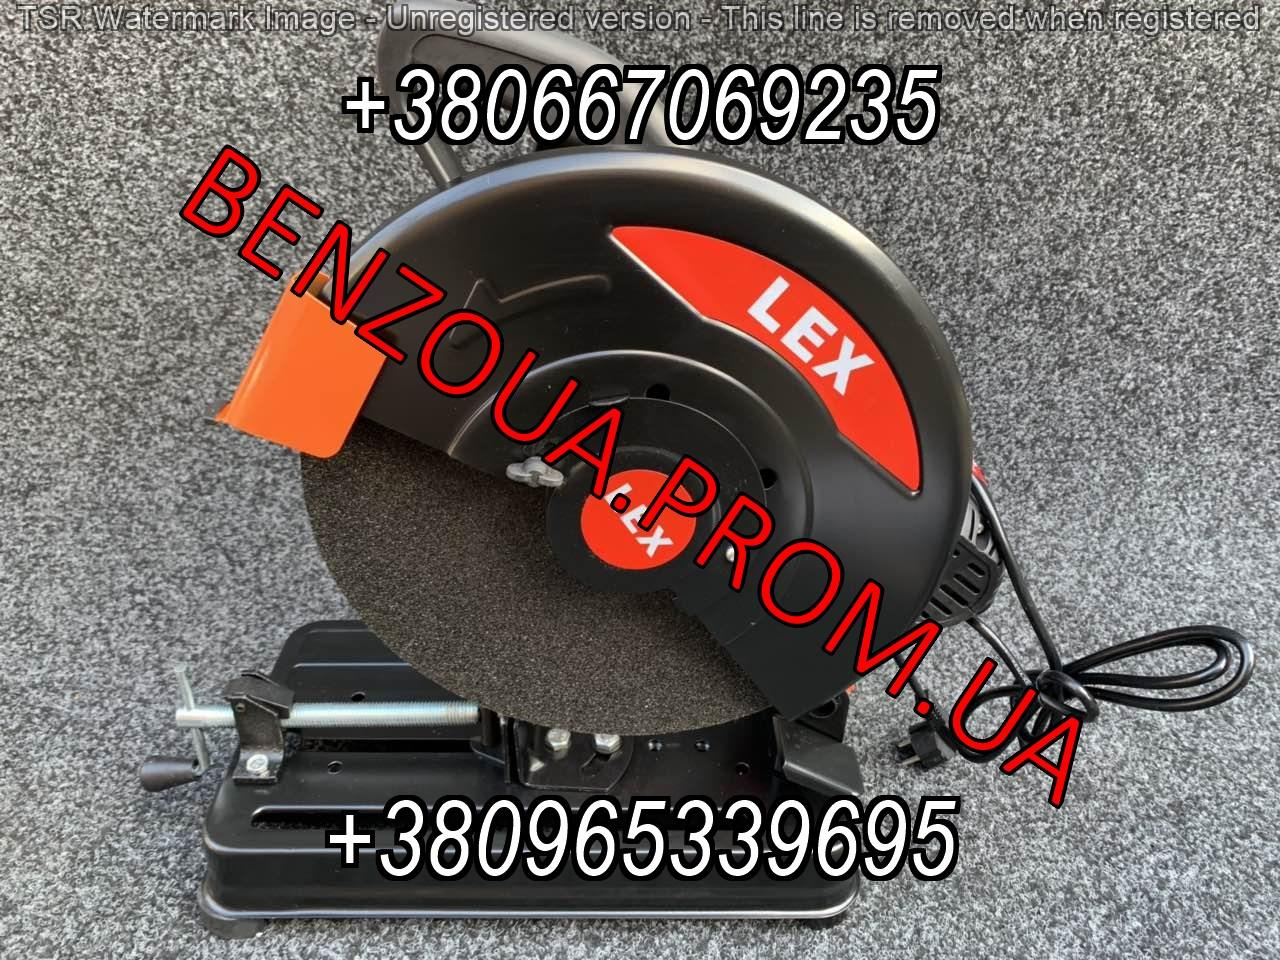 Металорез Lex 8011B 2900W 350mm ременной, труборез, монтажная пила